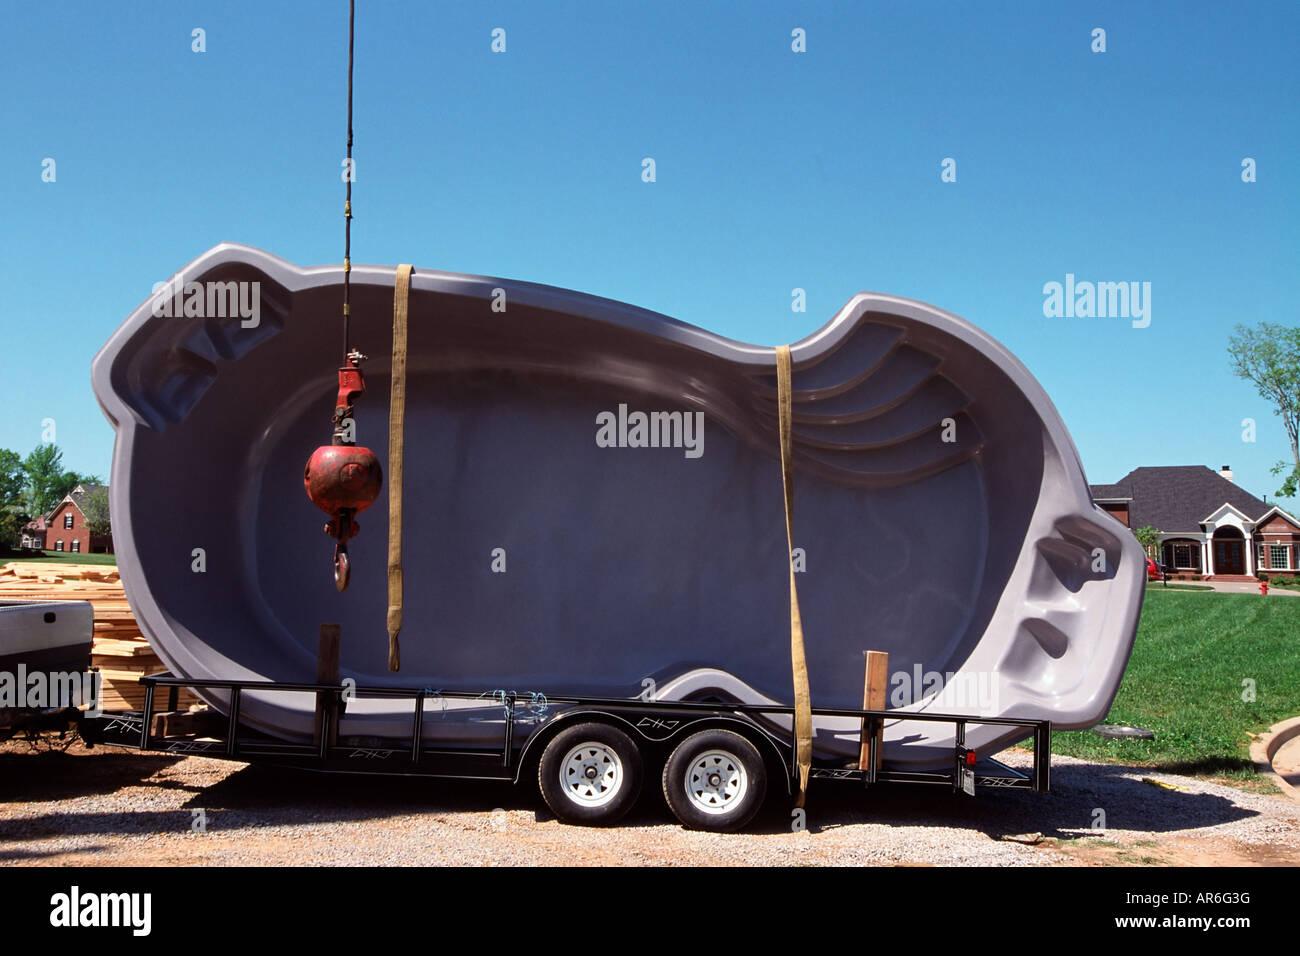 schwimmbad auf einem anh nger stockfoto bild 15955107. Black Bedroom Furniture Sets. Home Design Ideas